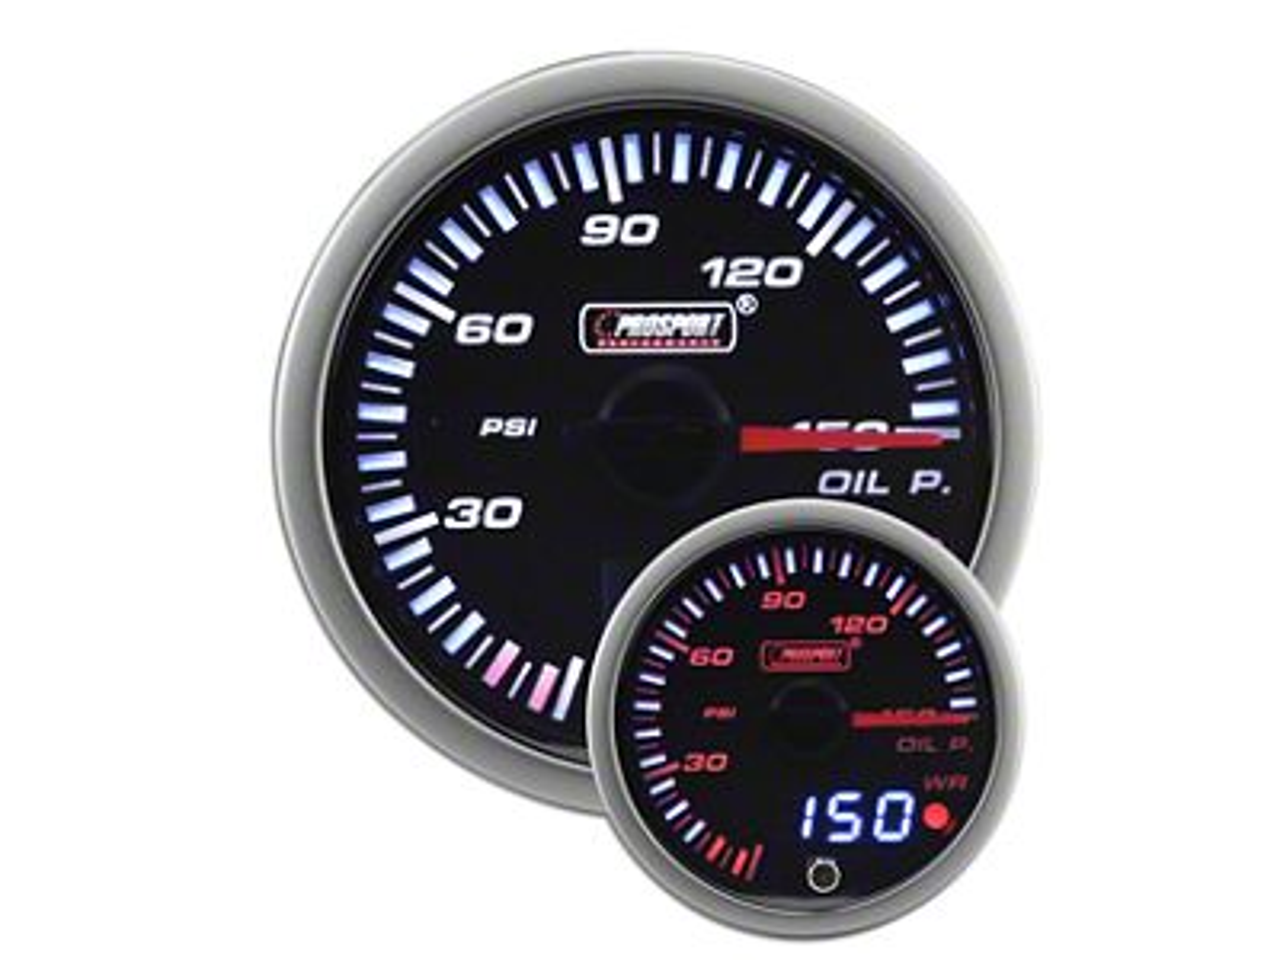 Prosport JDM Oil Pressure Gauge - Electrical (99-18 Silverado 1500)